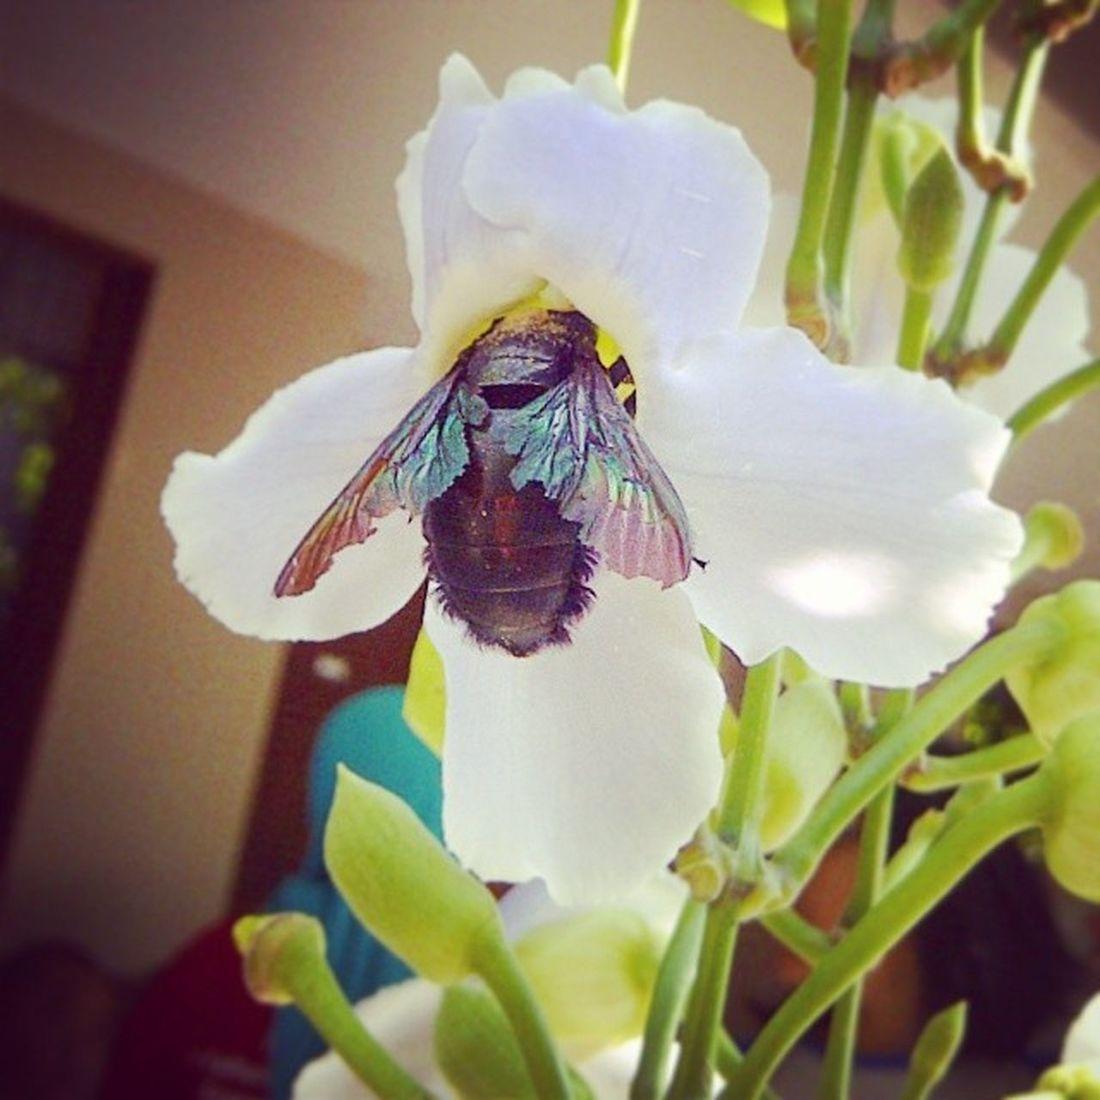 Nature Flower Insect Mutualismsymbiosis Solo CentralJava RumahBatu June twooonefour